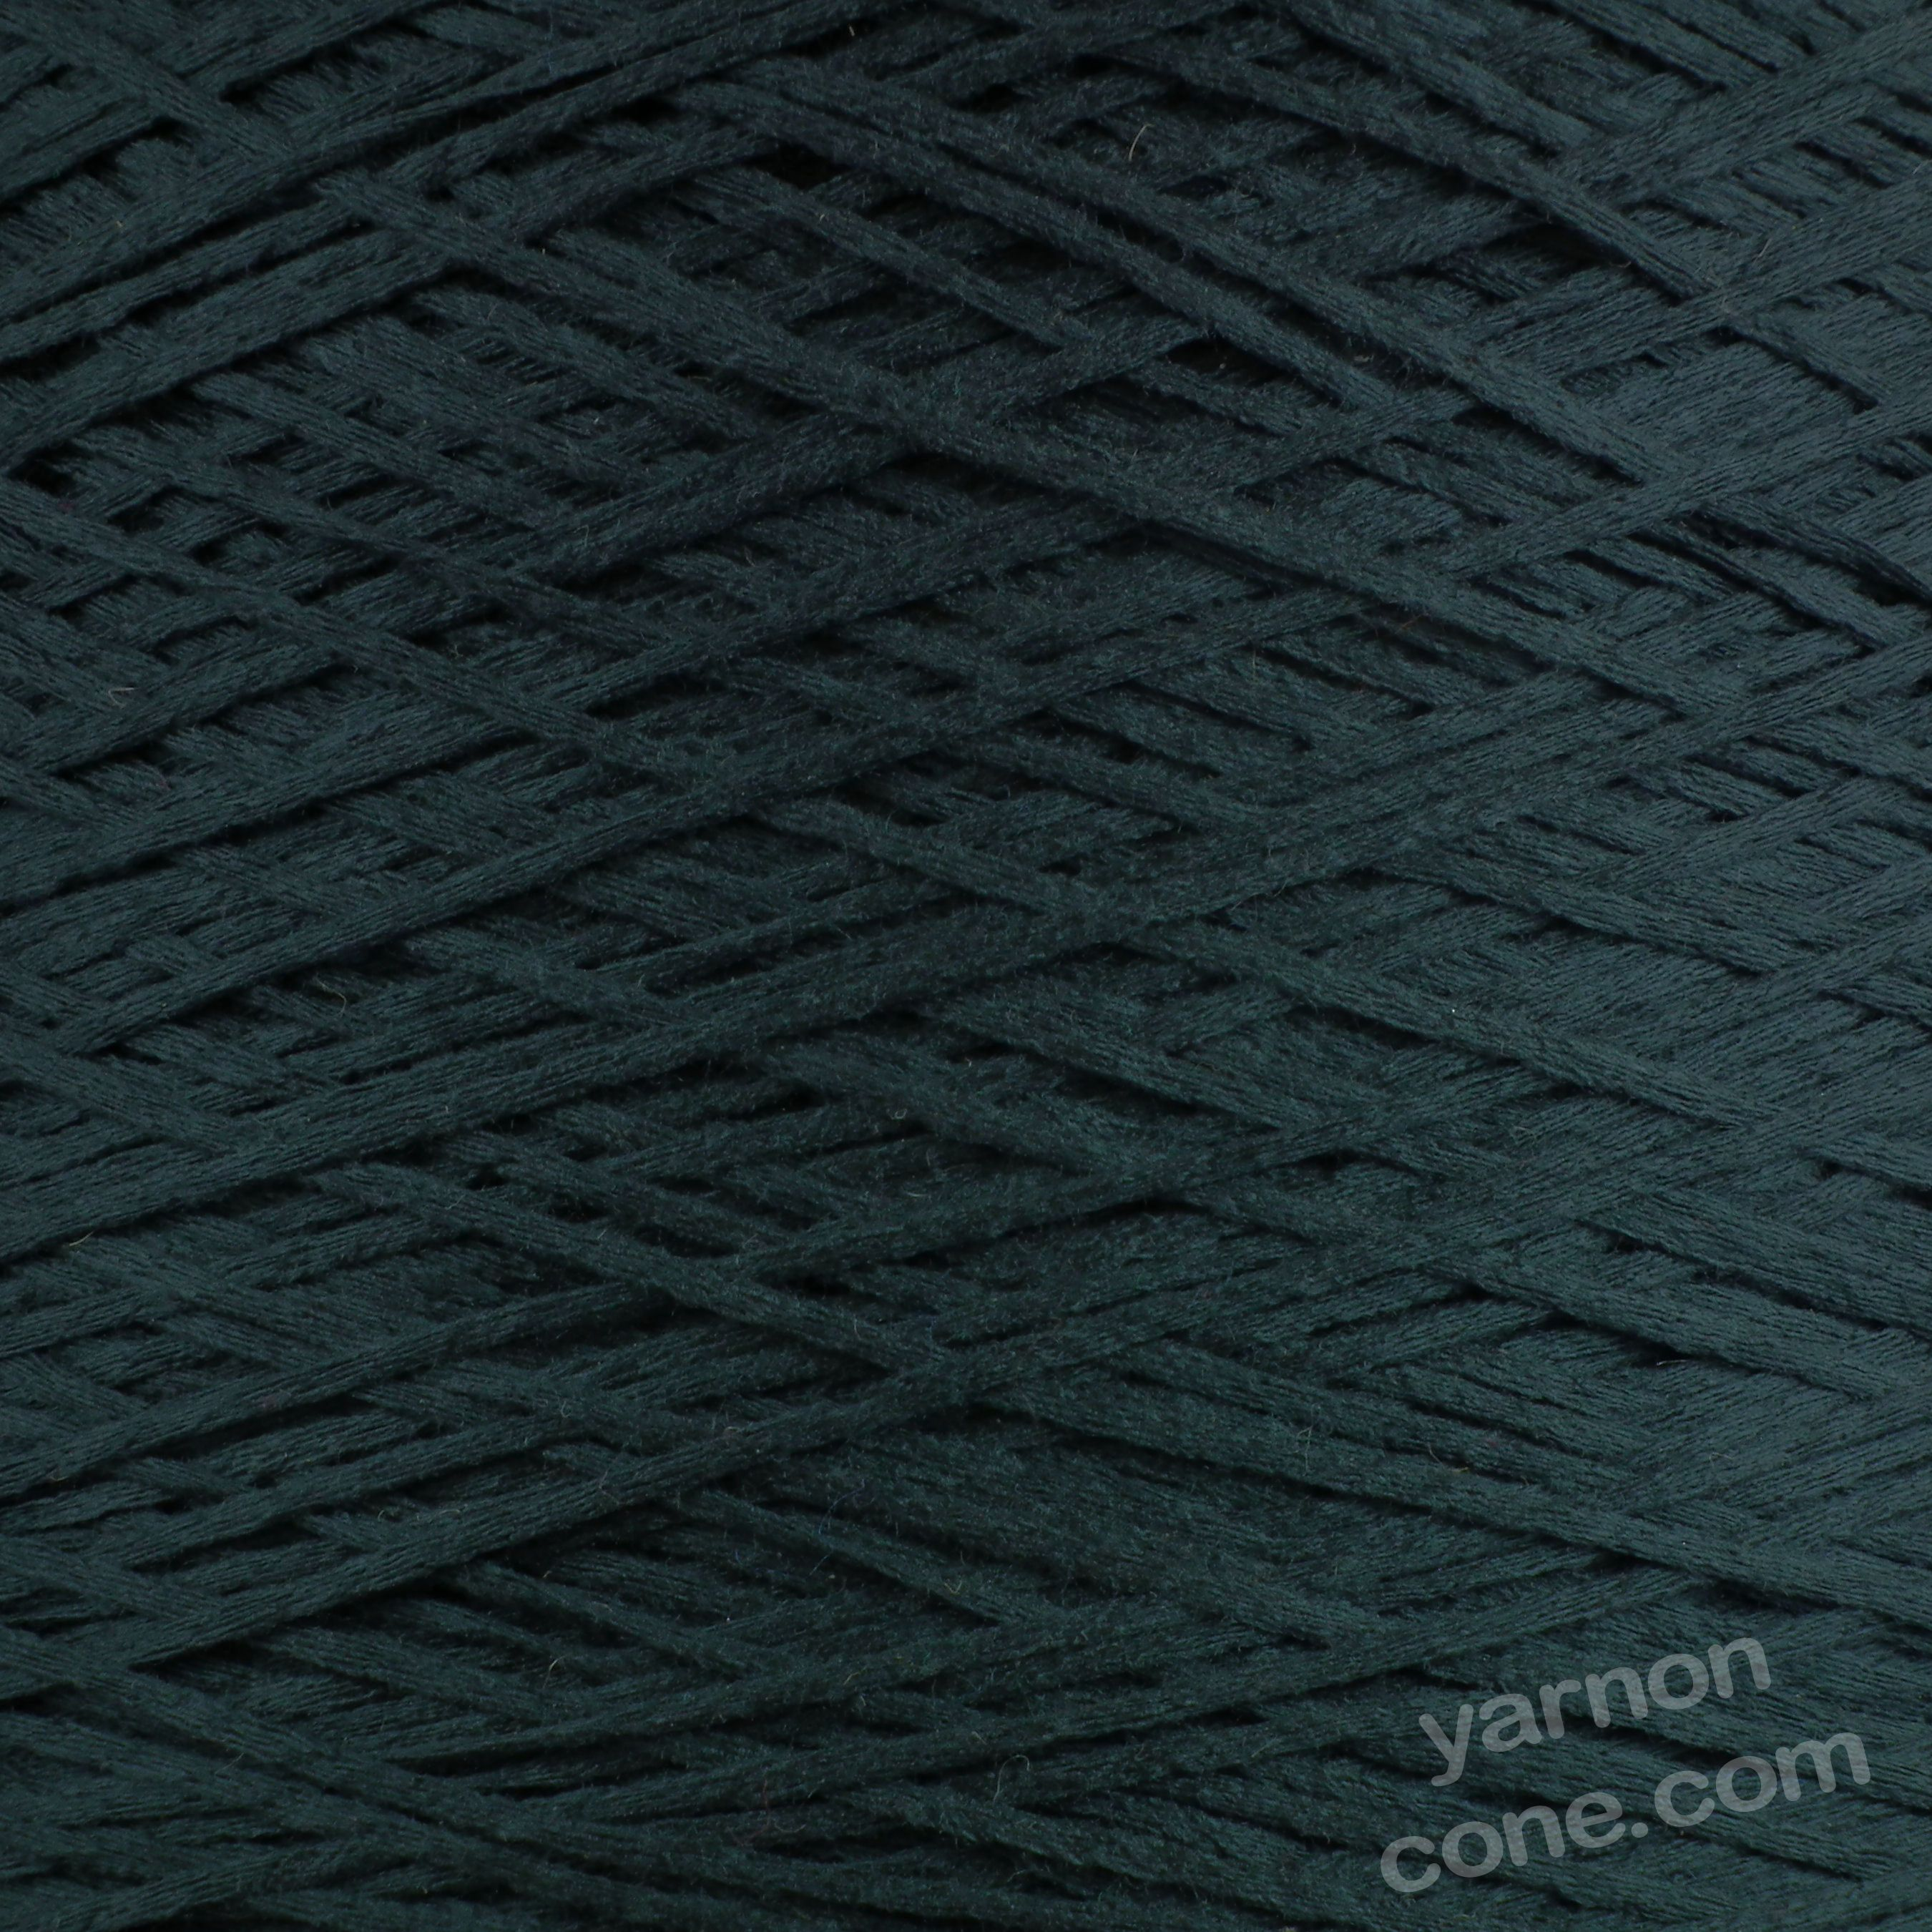 dark navy tape yarn fettucina cone 4 ply